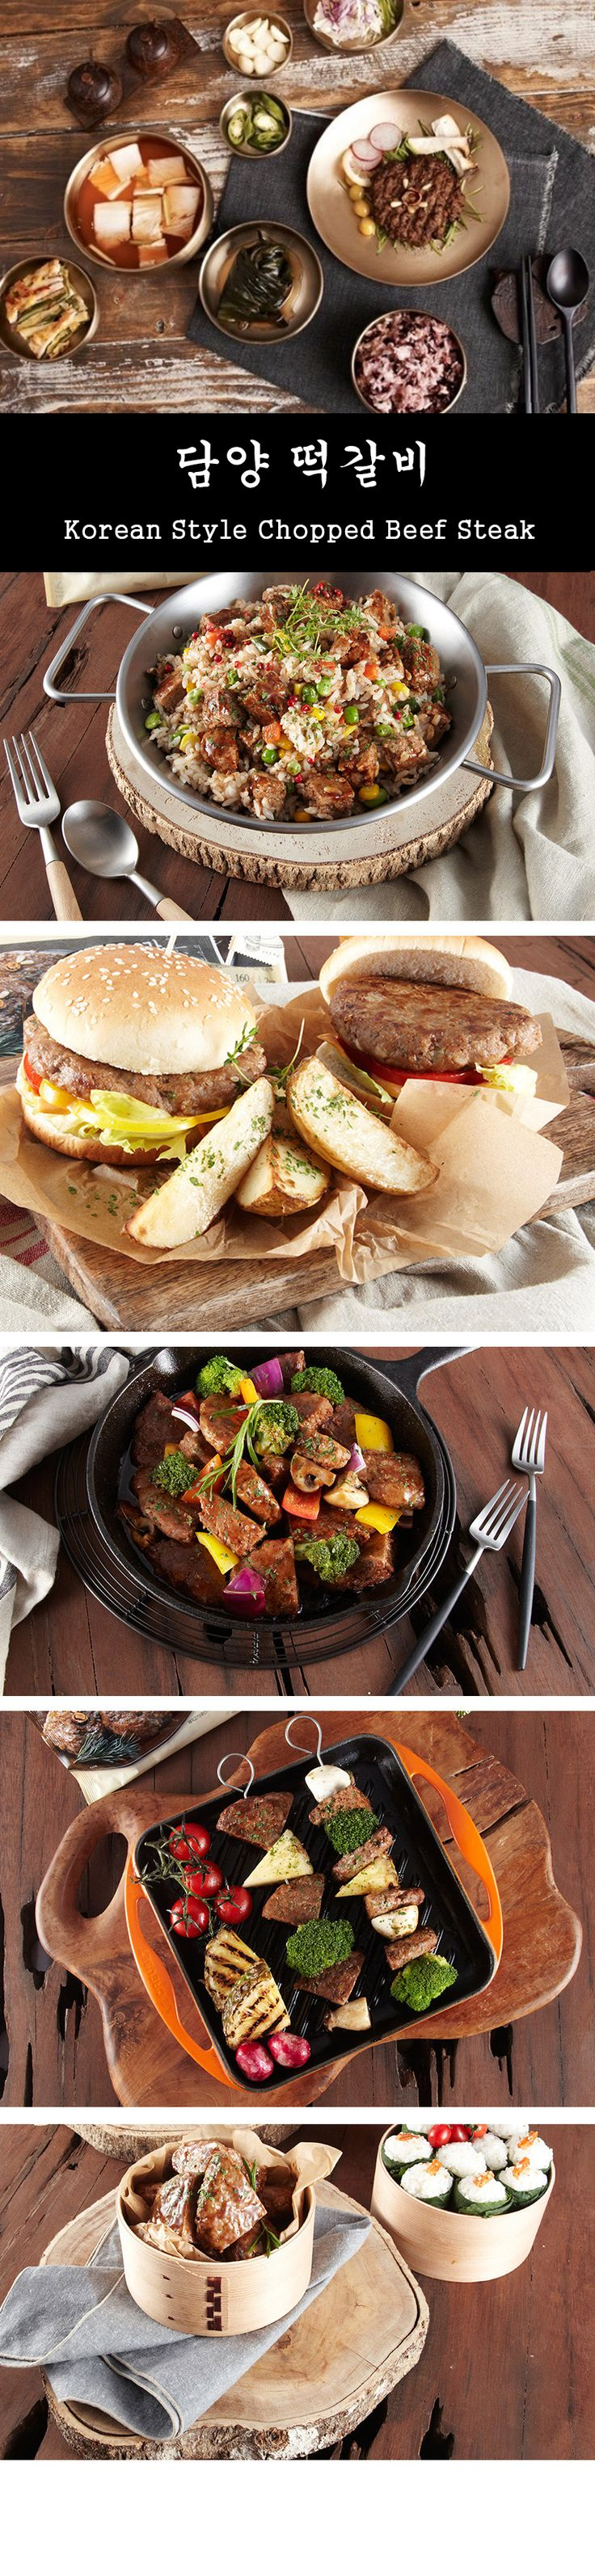 Korean Style Chopped Beef Steak/ 담양 떡갈비 (1pk)